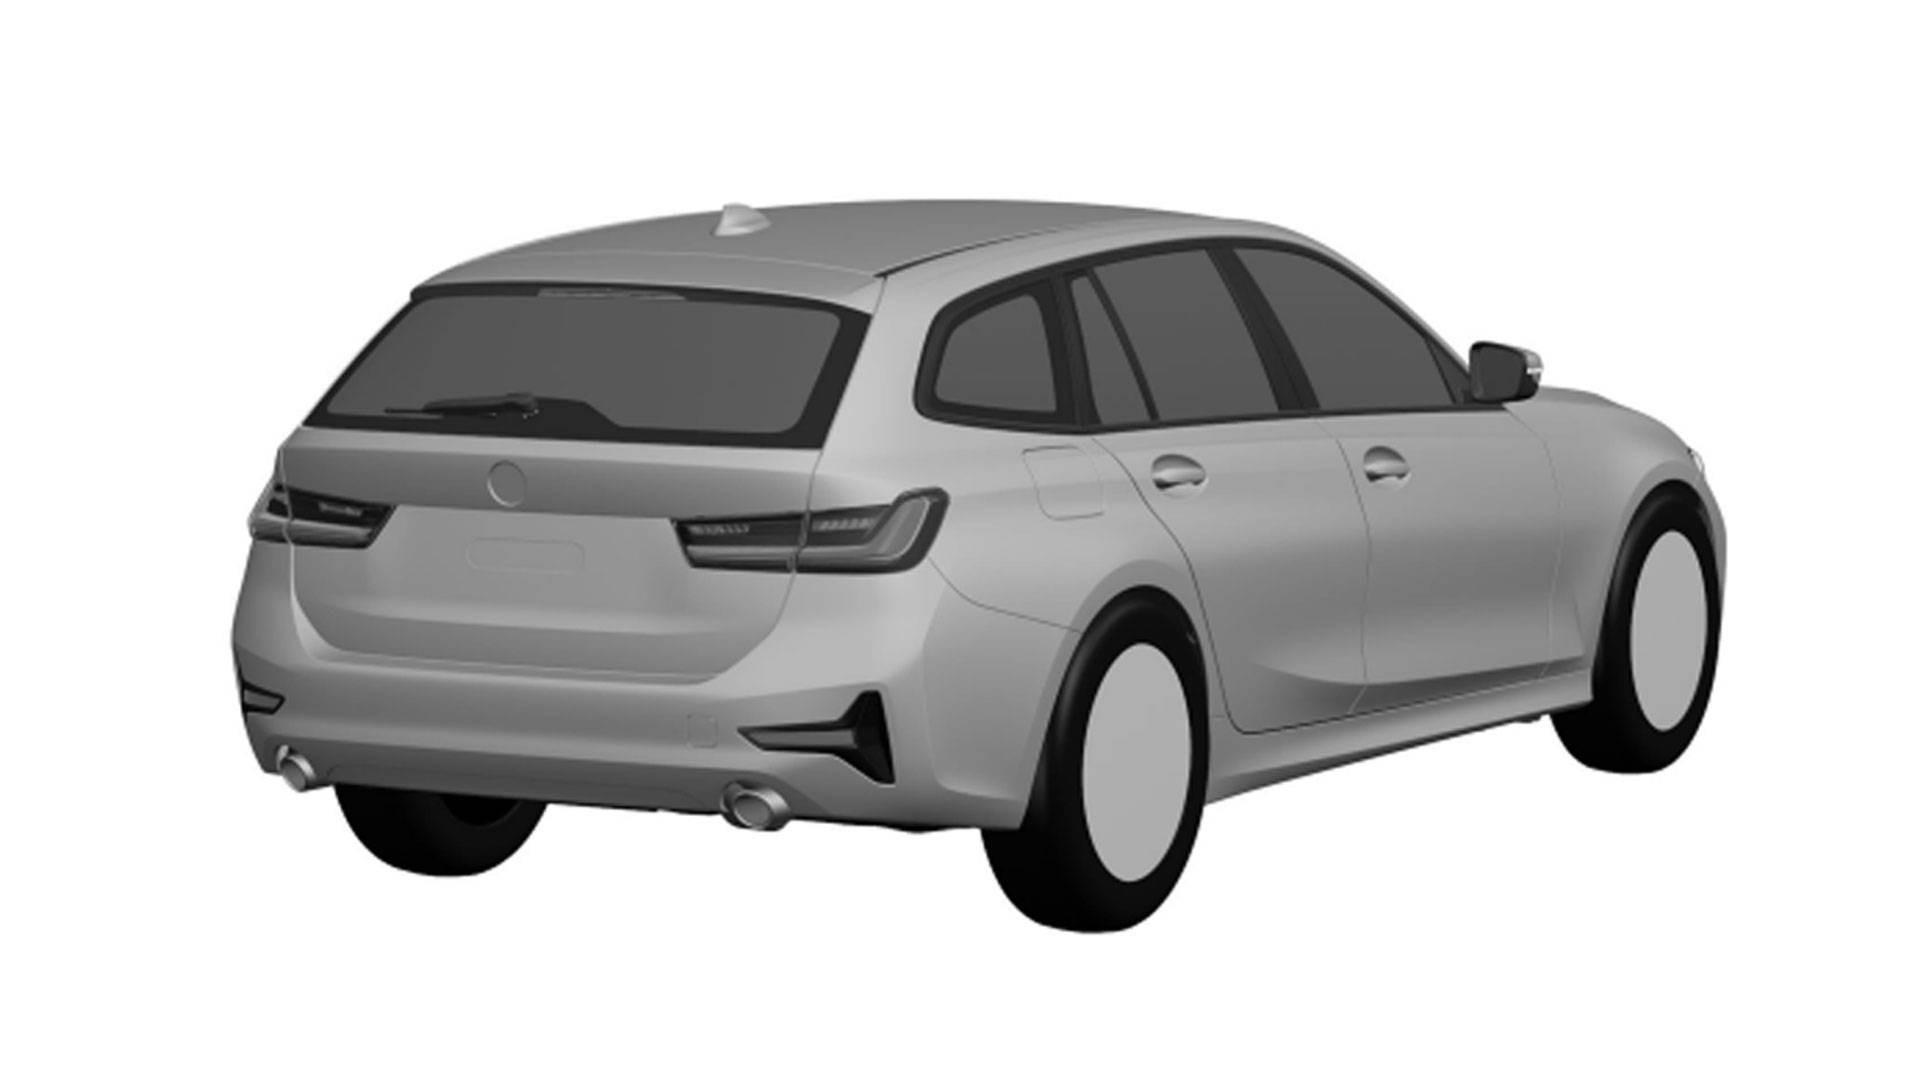 bmw-serie-3-touring-2019-patente (2)